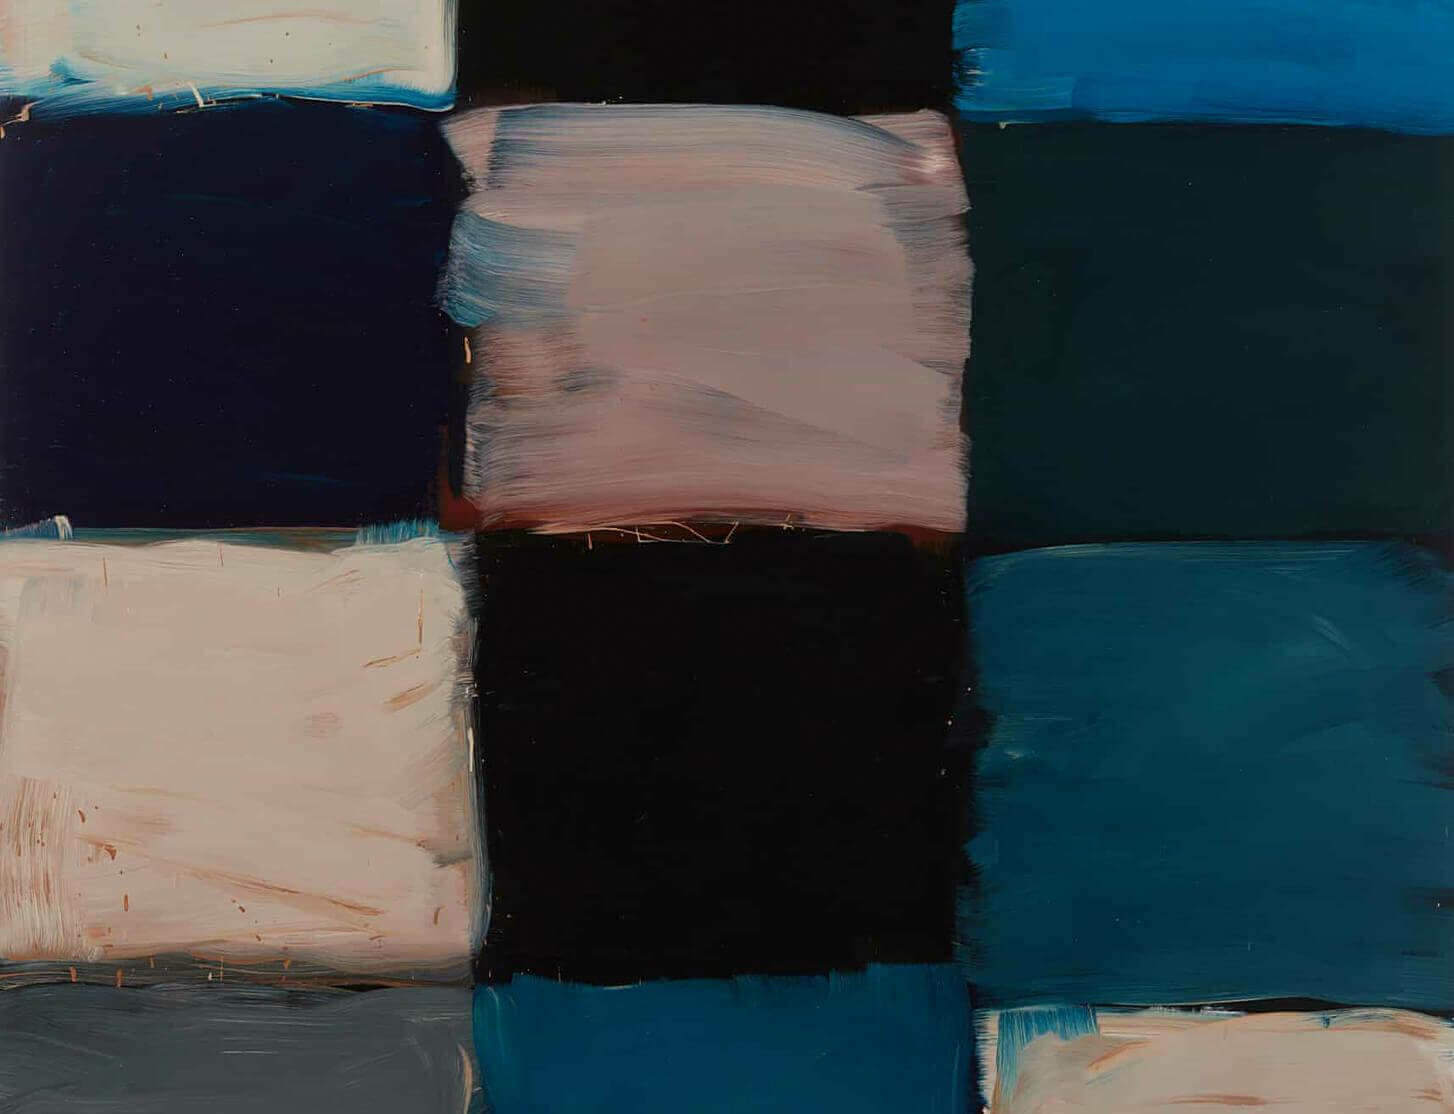 Jonathan Jones reviews 'Sean Scully: Sea Star' at The National Gallery